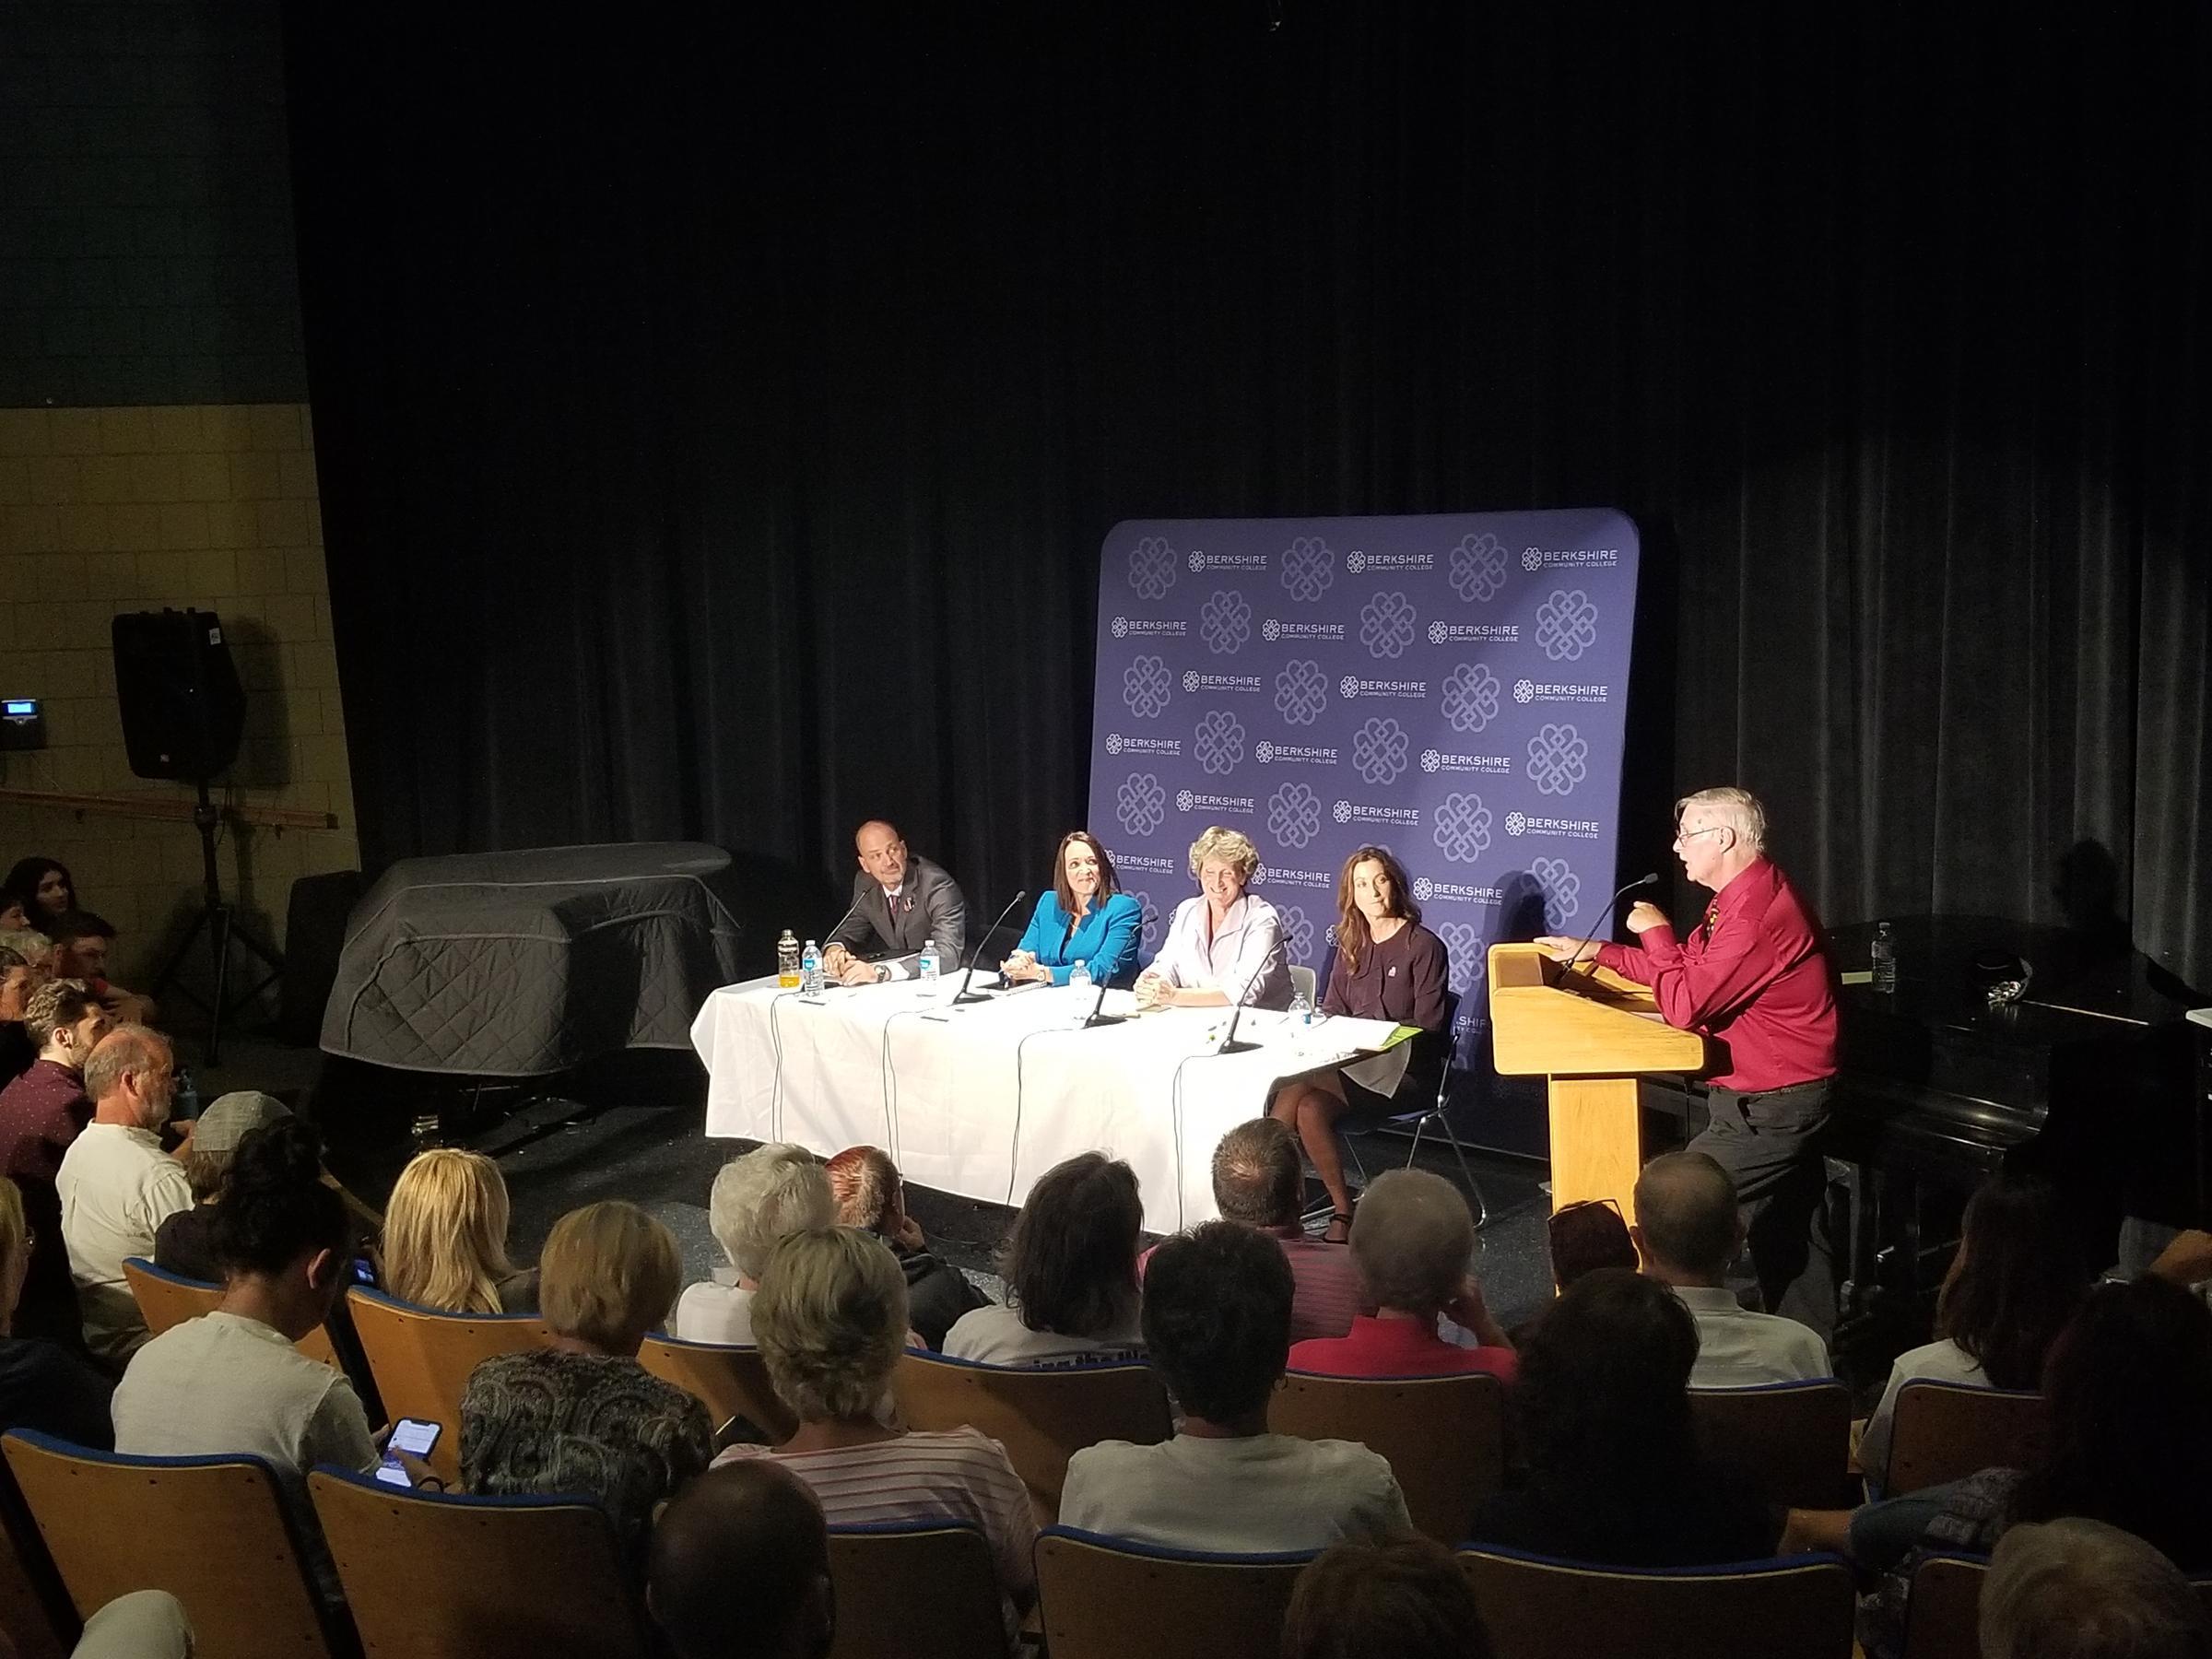 Scott Graves, Linda Tyer, Karen Kalinowsky, Melissa Mazzeo, and moderator Larry Kratka